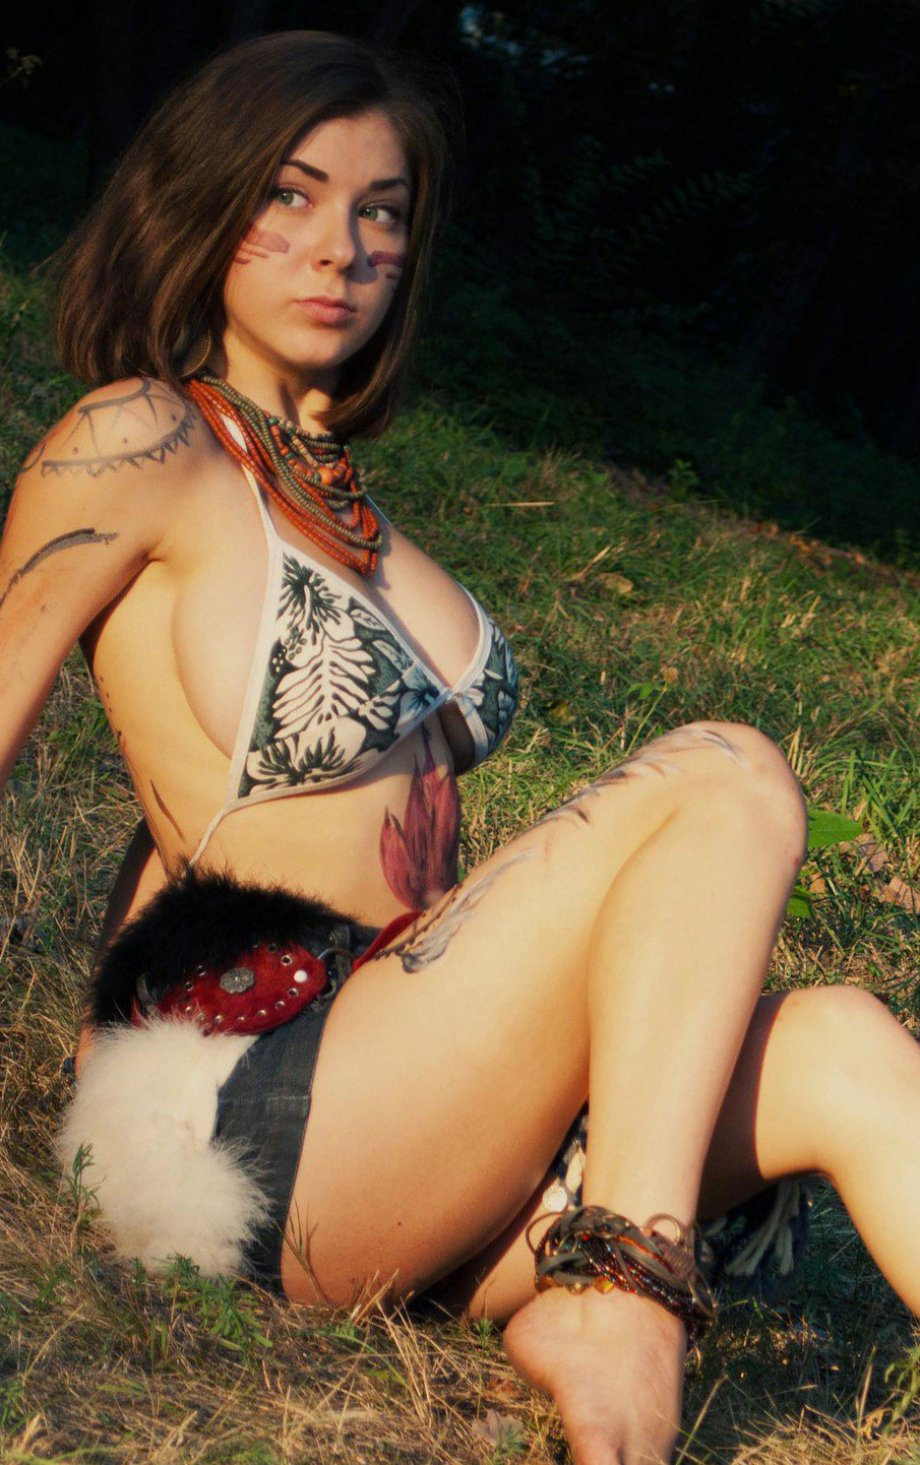 Красивые девушки в бикини и белье